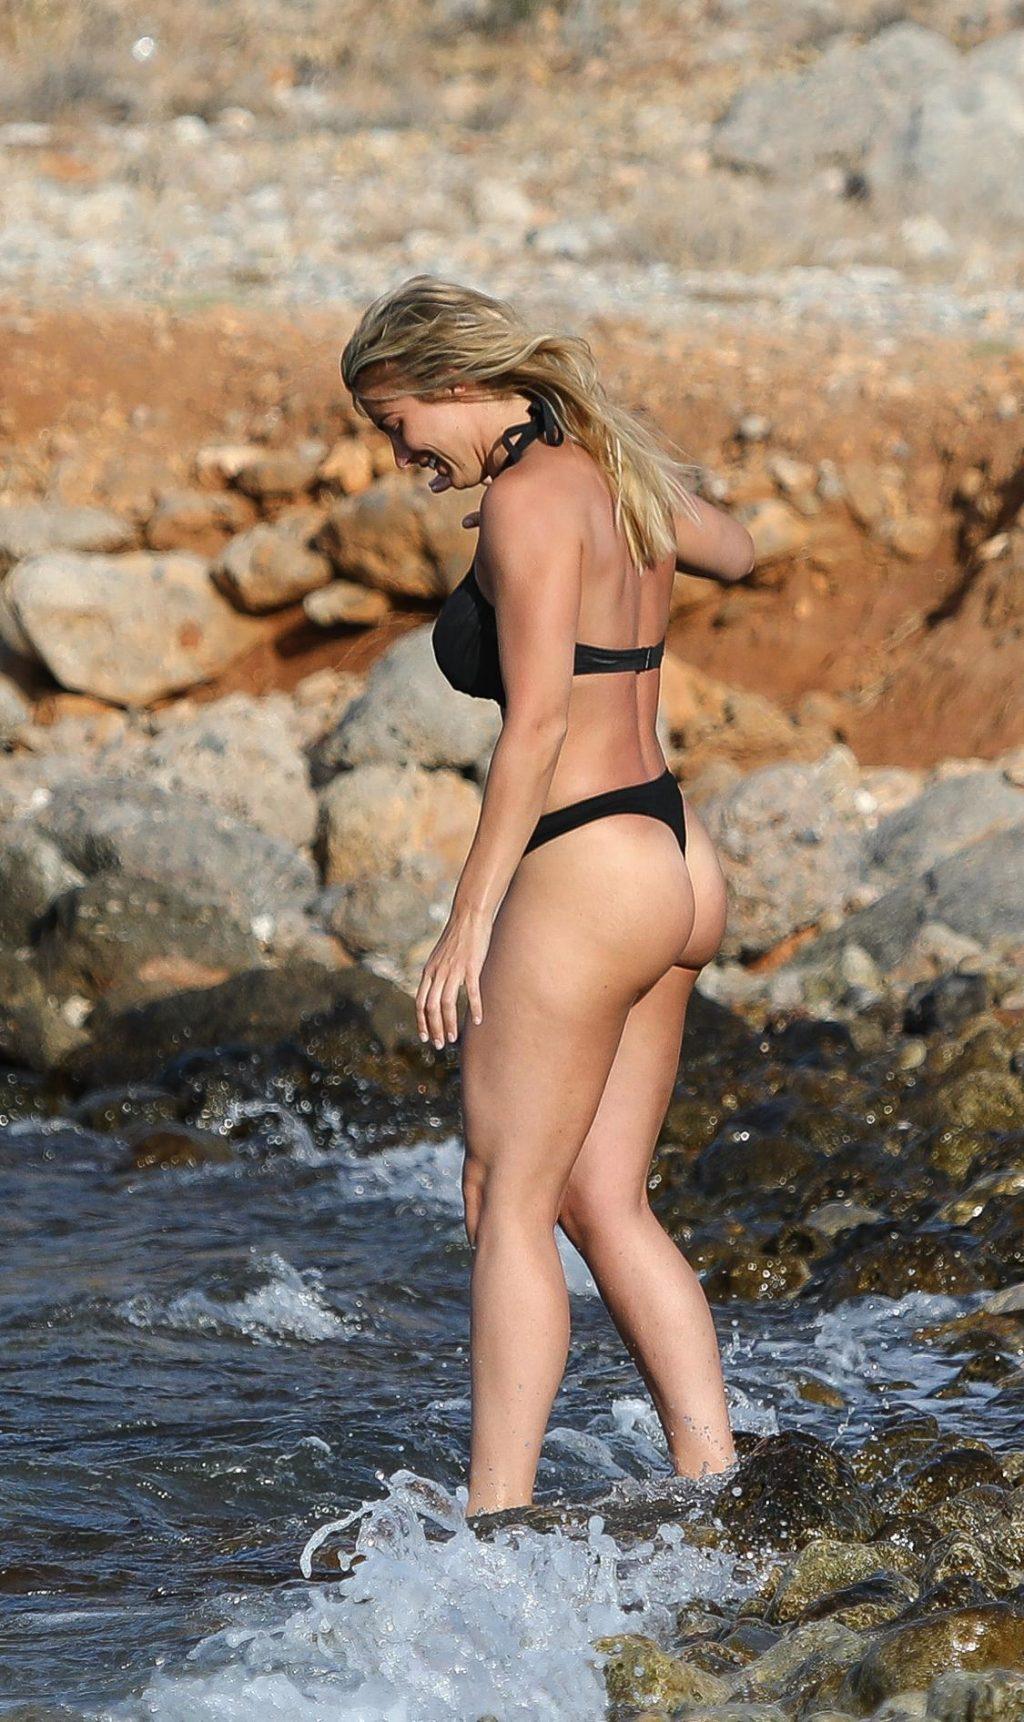 Gemma Atkinson Bikini girlfappening.com 1